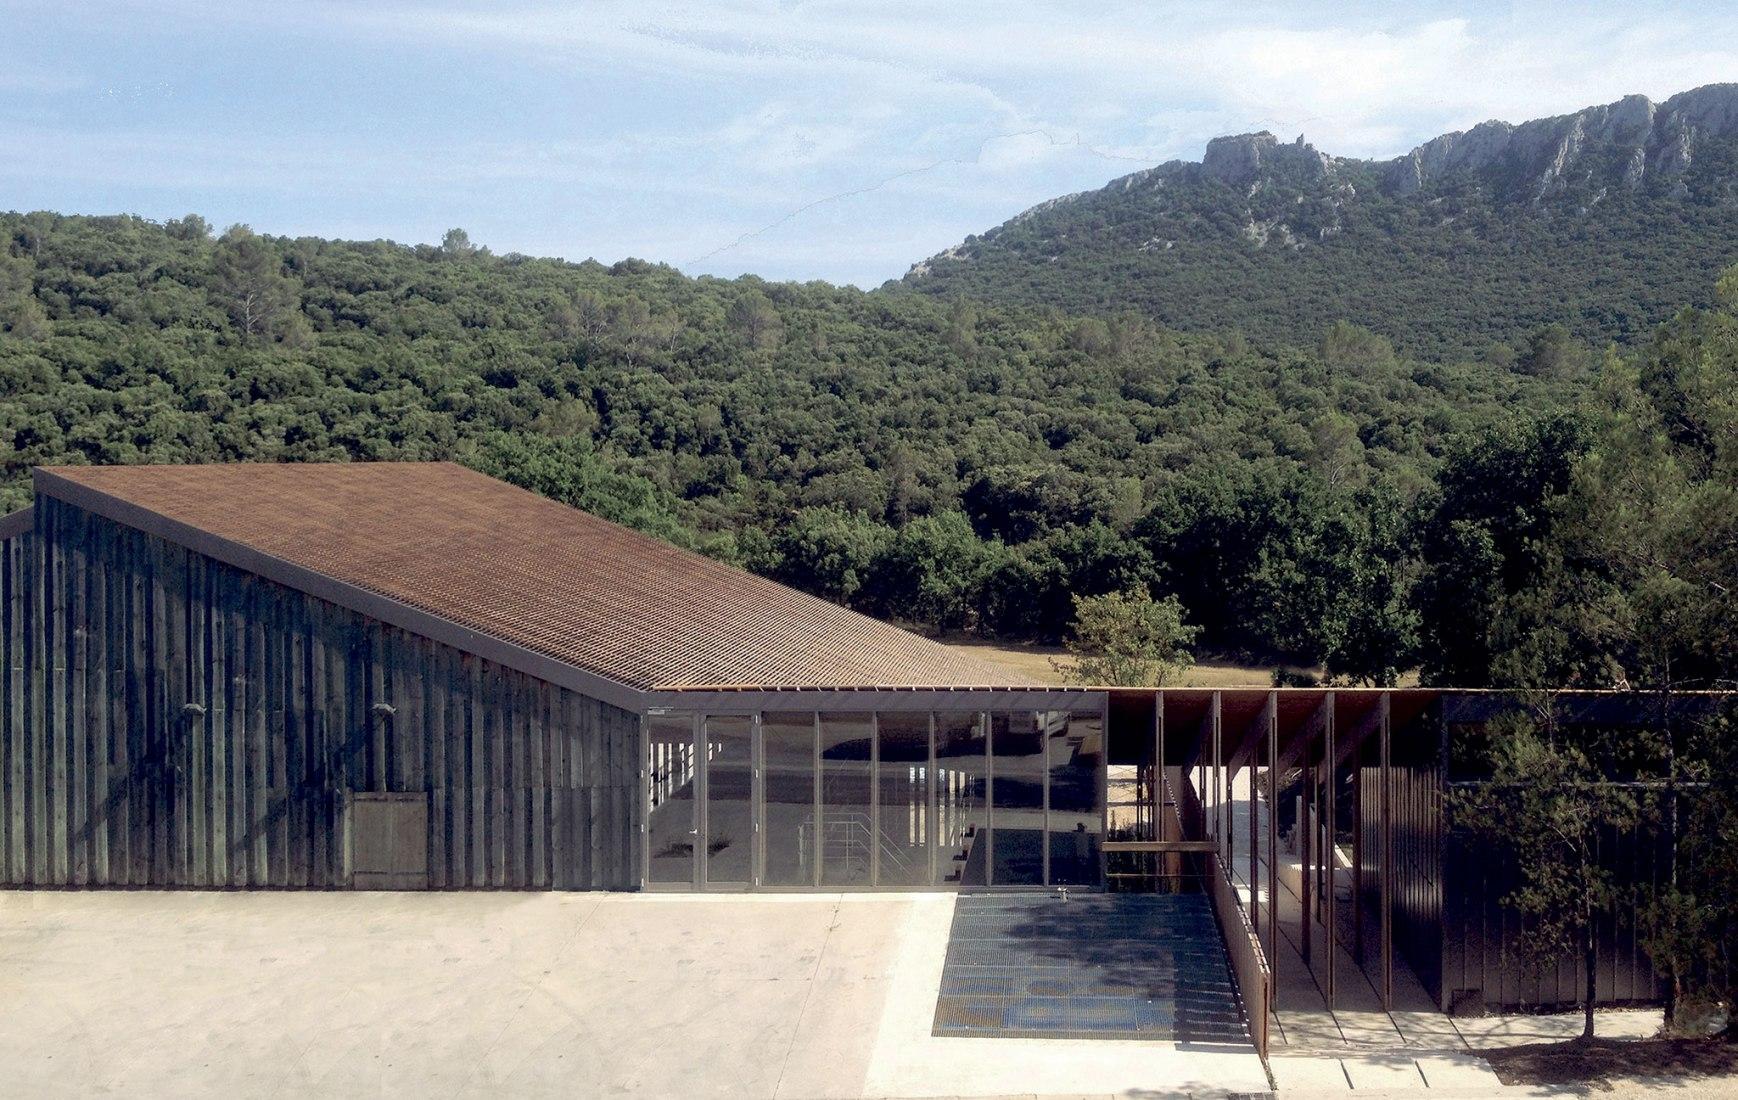 FINALISTA PREMIOS INTERNACIONALES. Cava Vini-vitícola Domaine de l' Hortus por Miquel Batlle, Michèle Orliac. Fotografía por michele&miquel